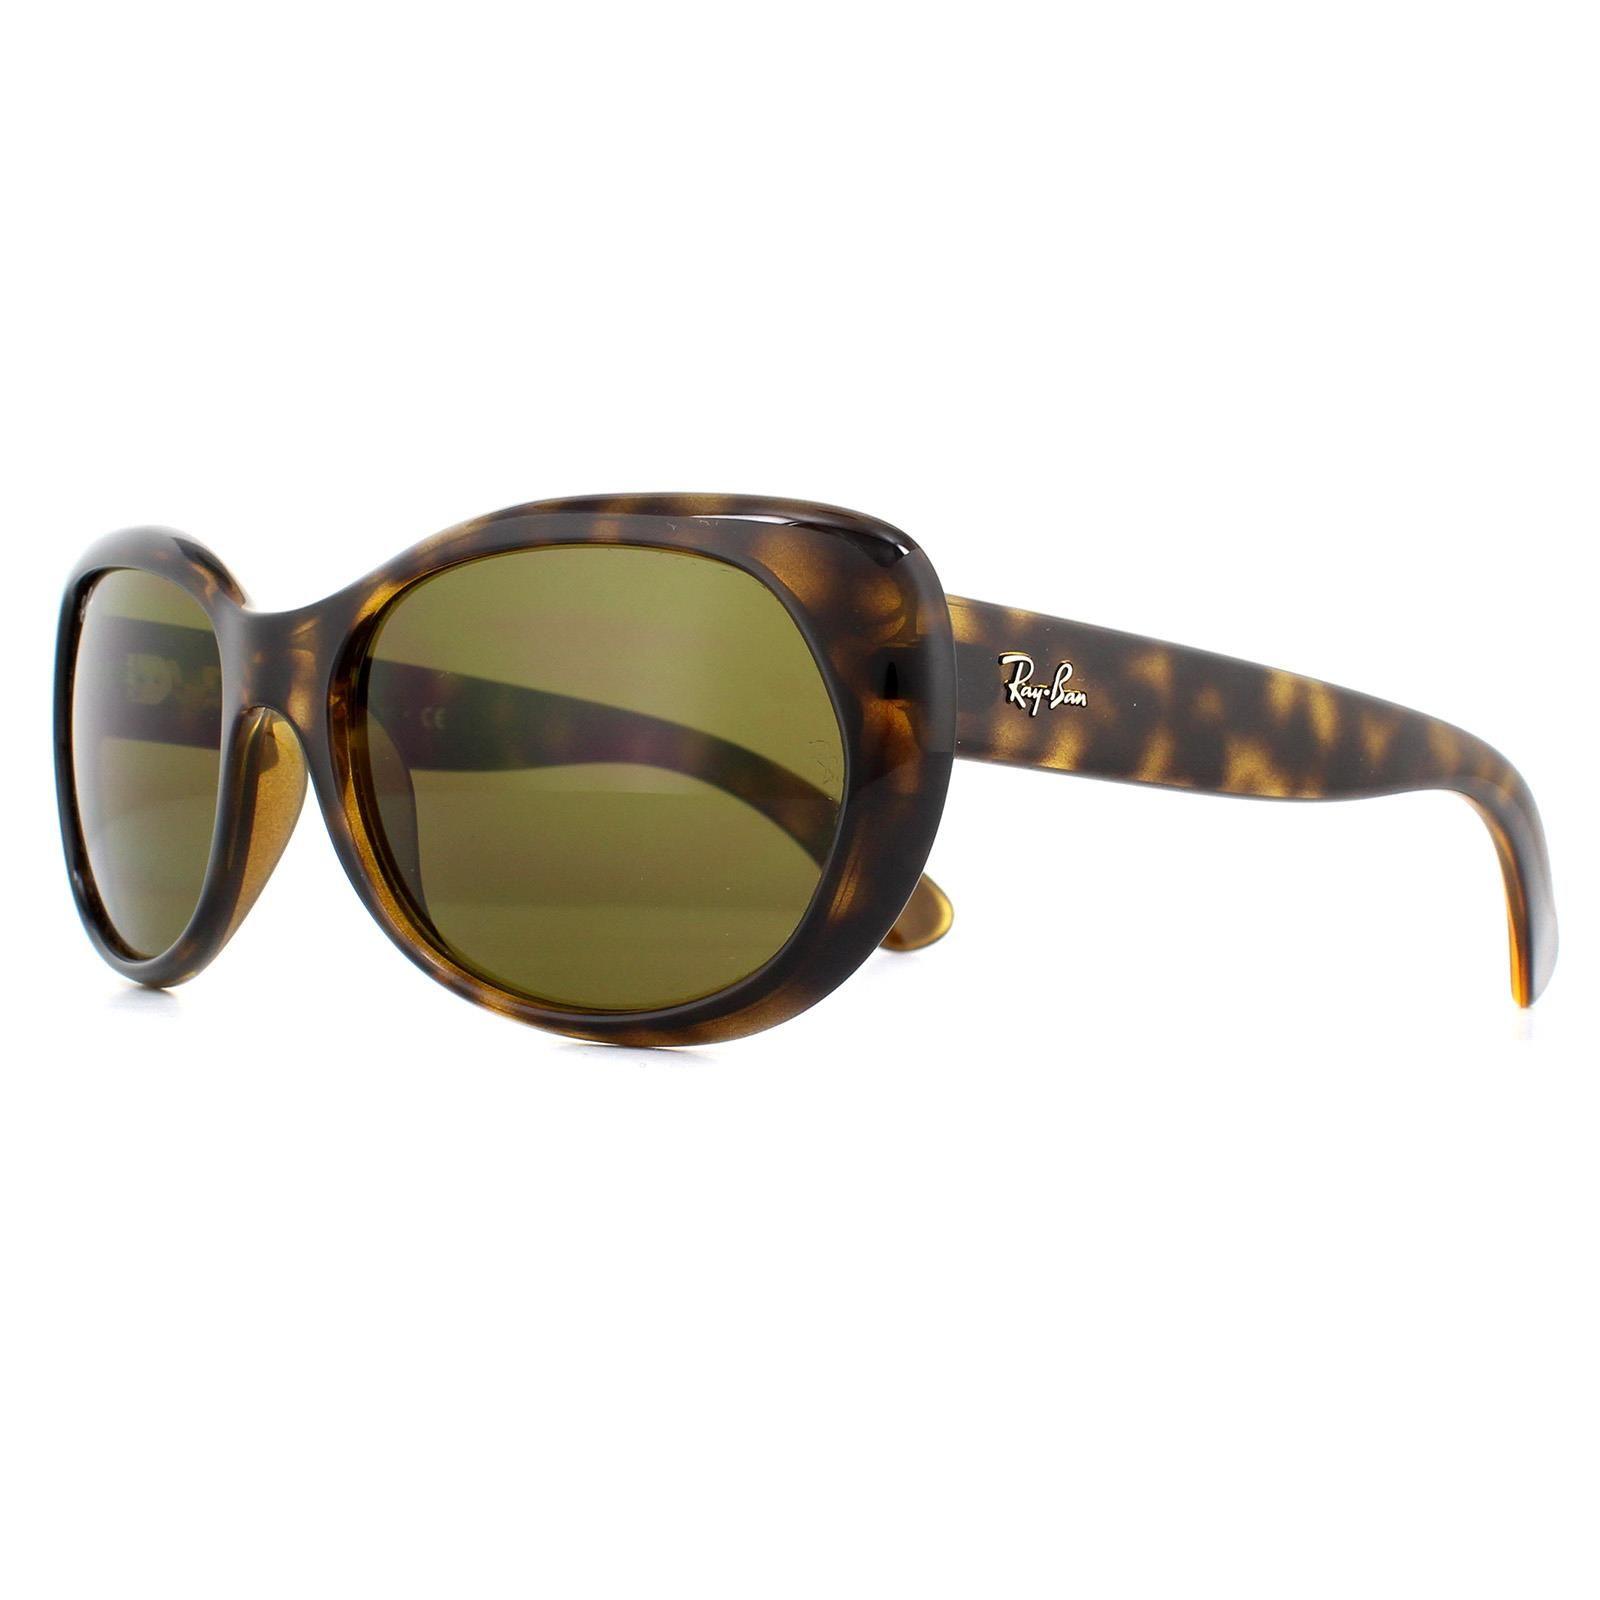 Ray-Ban Sunglasses 4325 710/73 Havana Brown